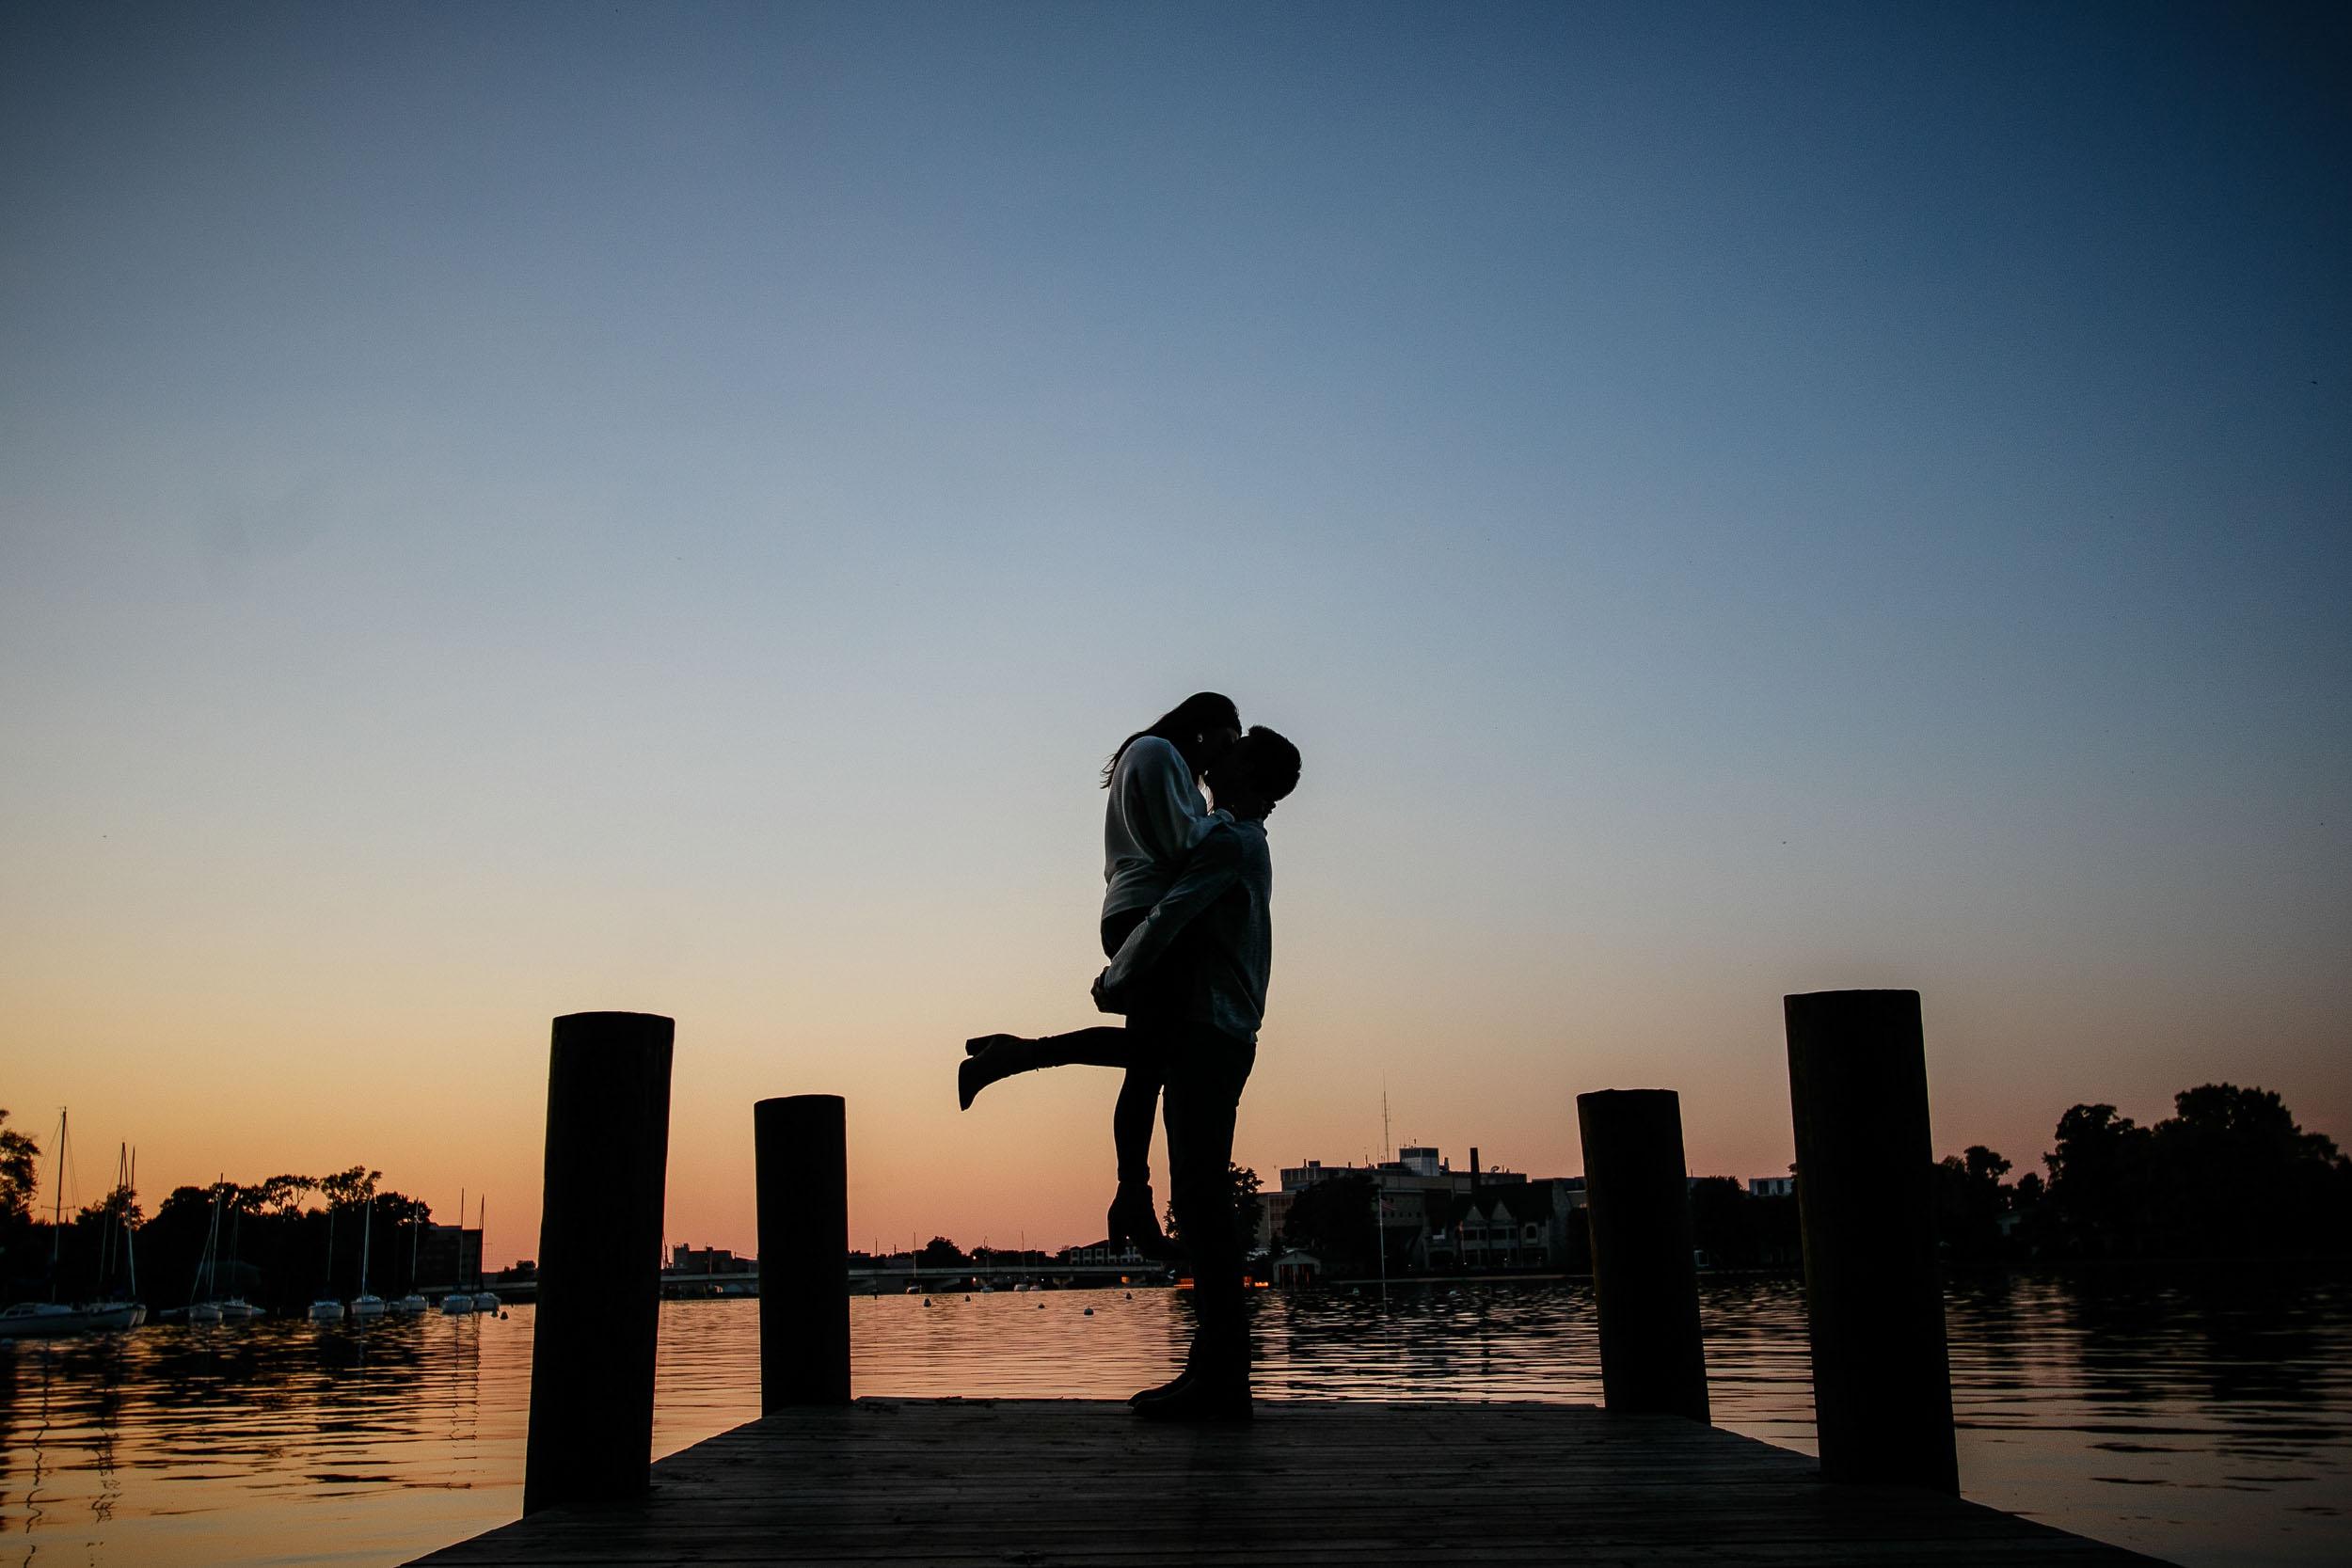 fall-engagement-photos-riverside-park-neenah-wisconsin--adam-shea-photography-green-bay-appleton-neenah-photographer-12.jpg